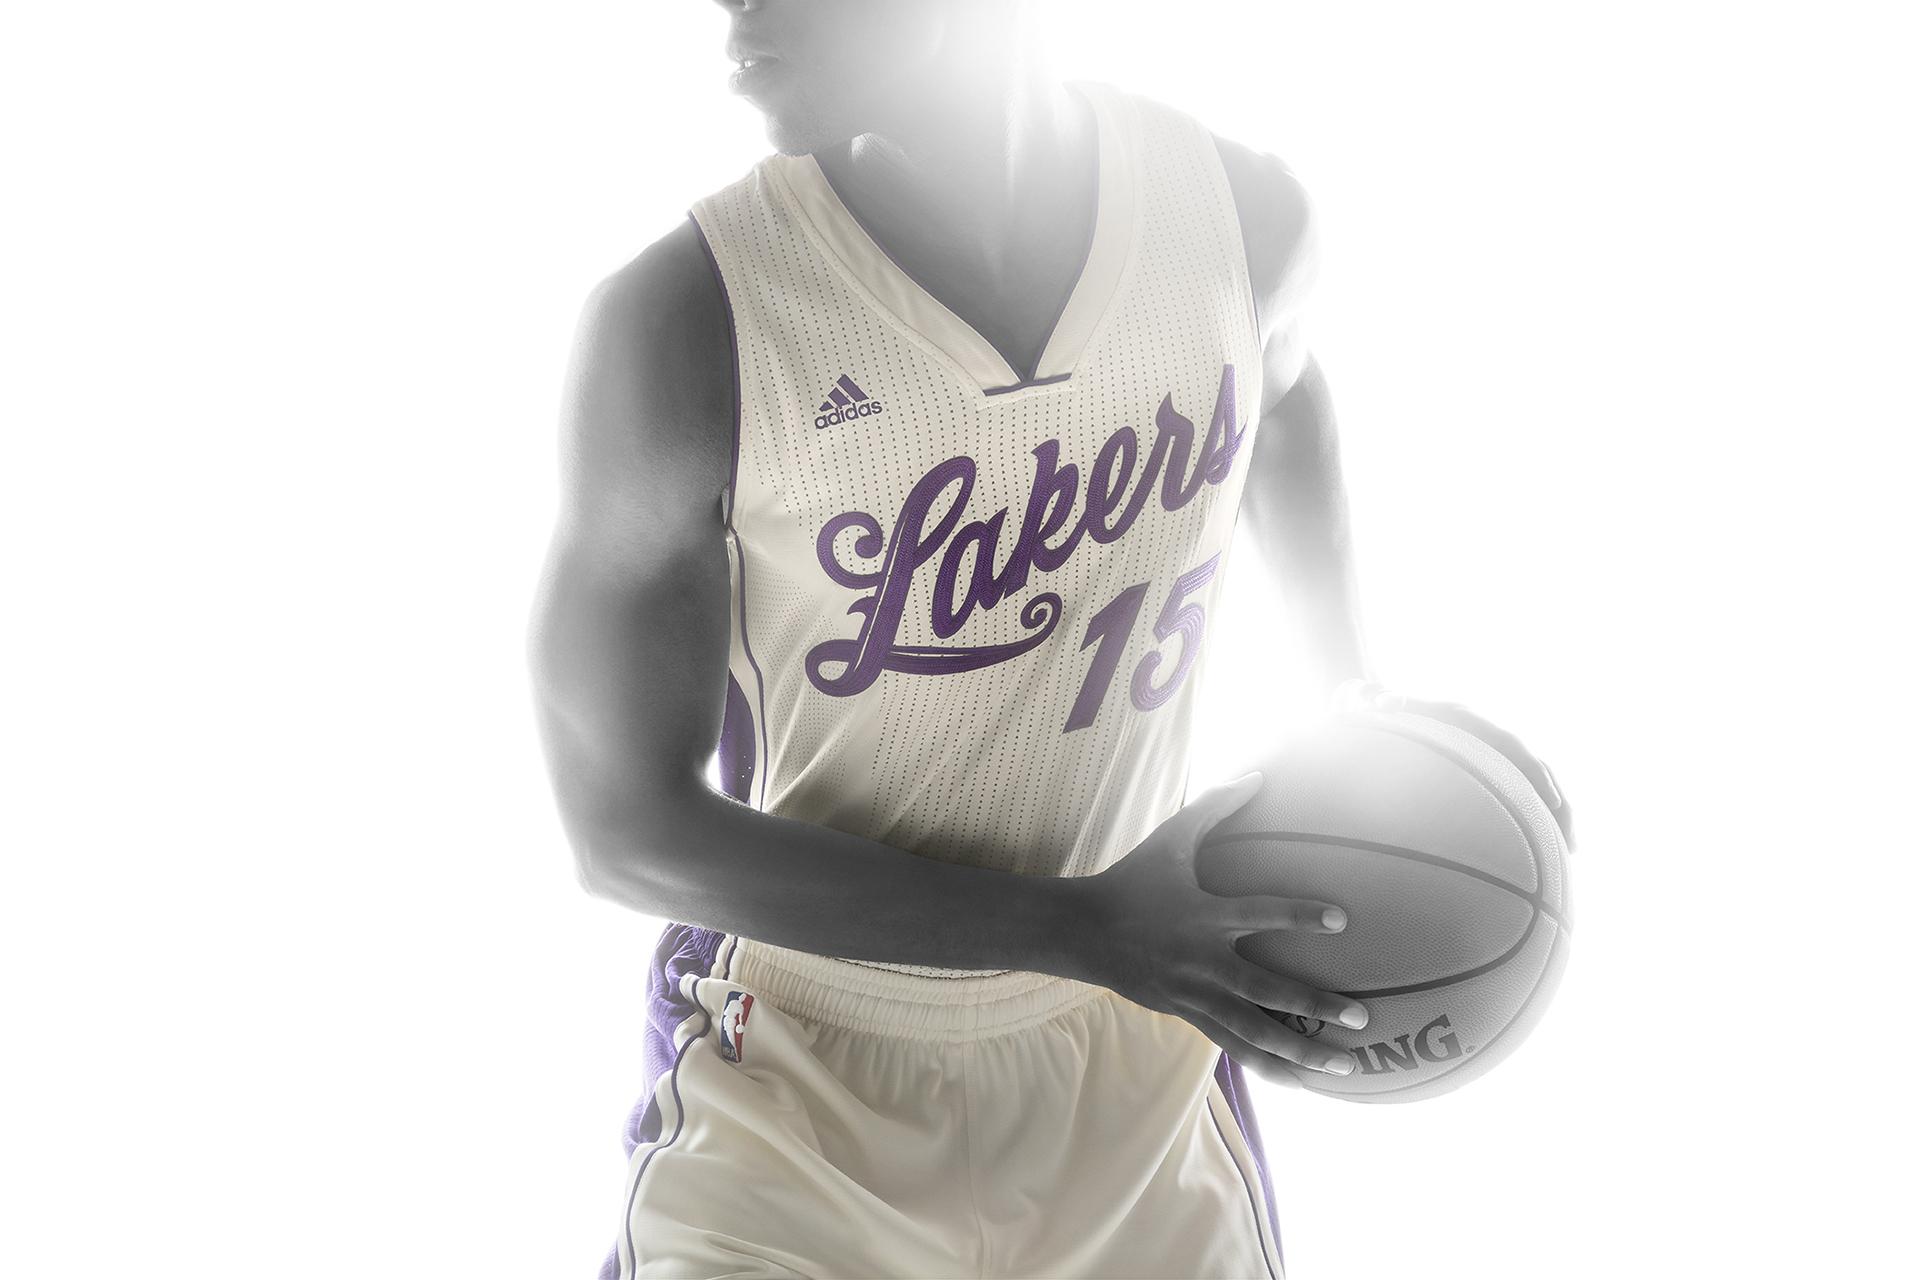 FW15_XmasJers_Torso_Lakers.jpg